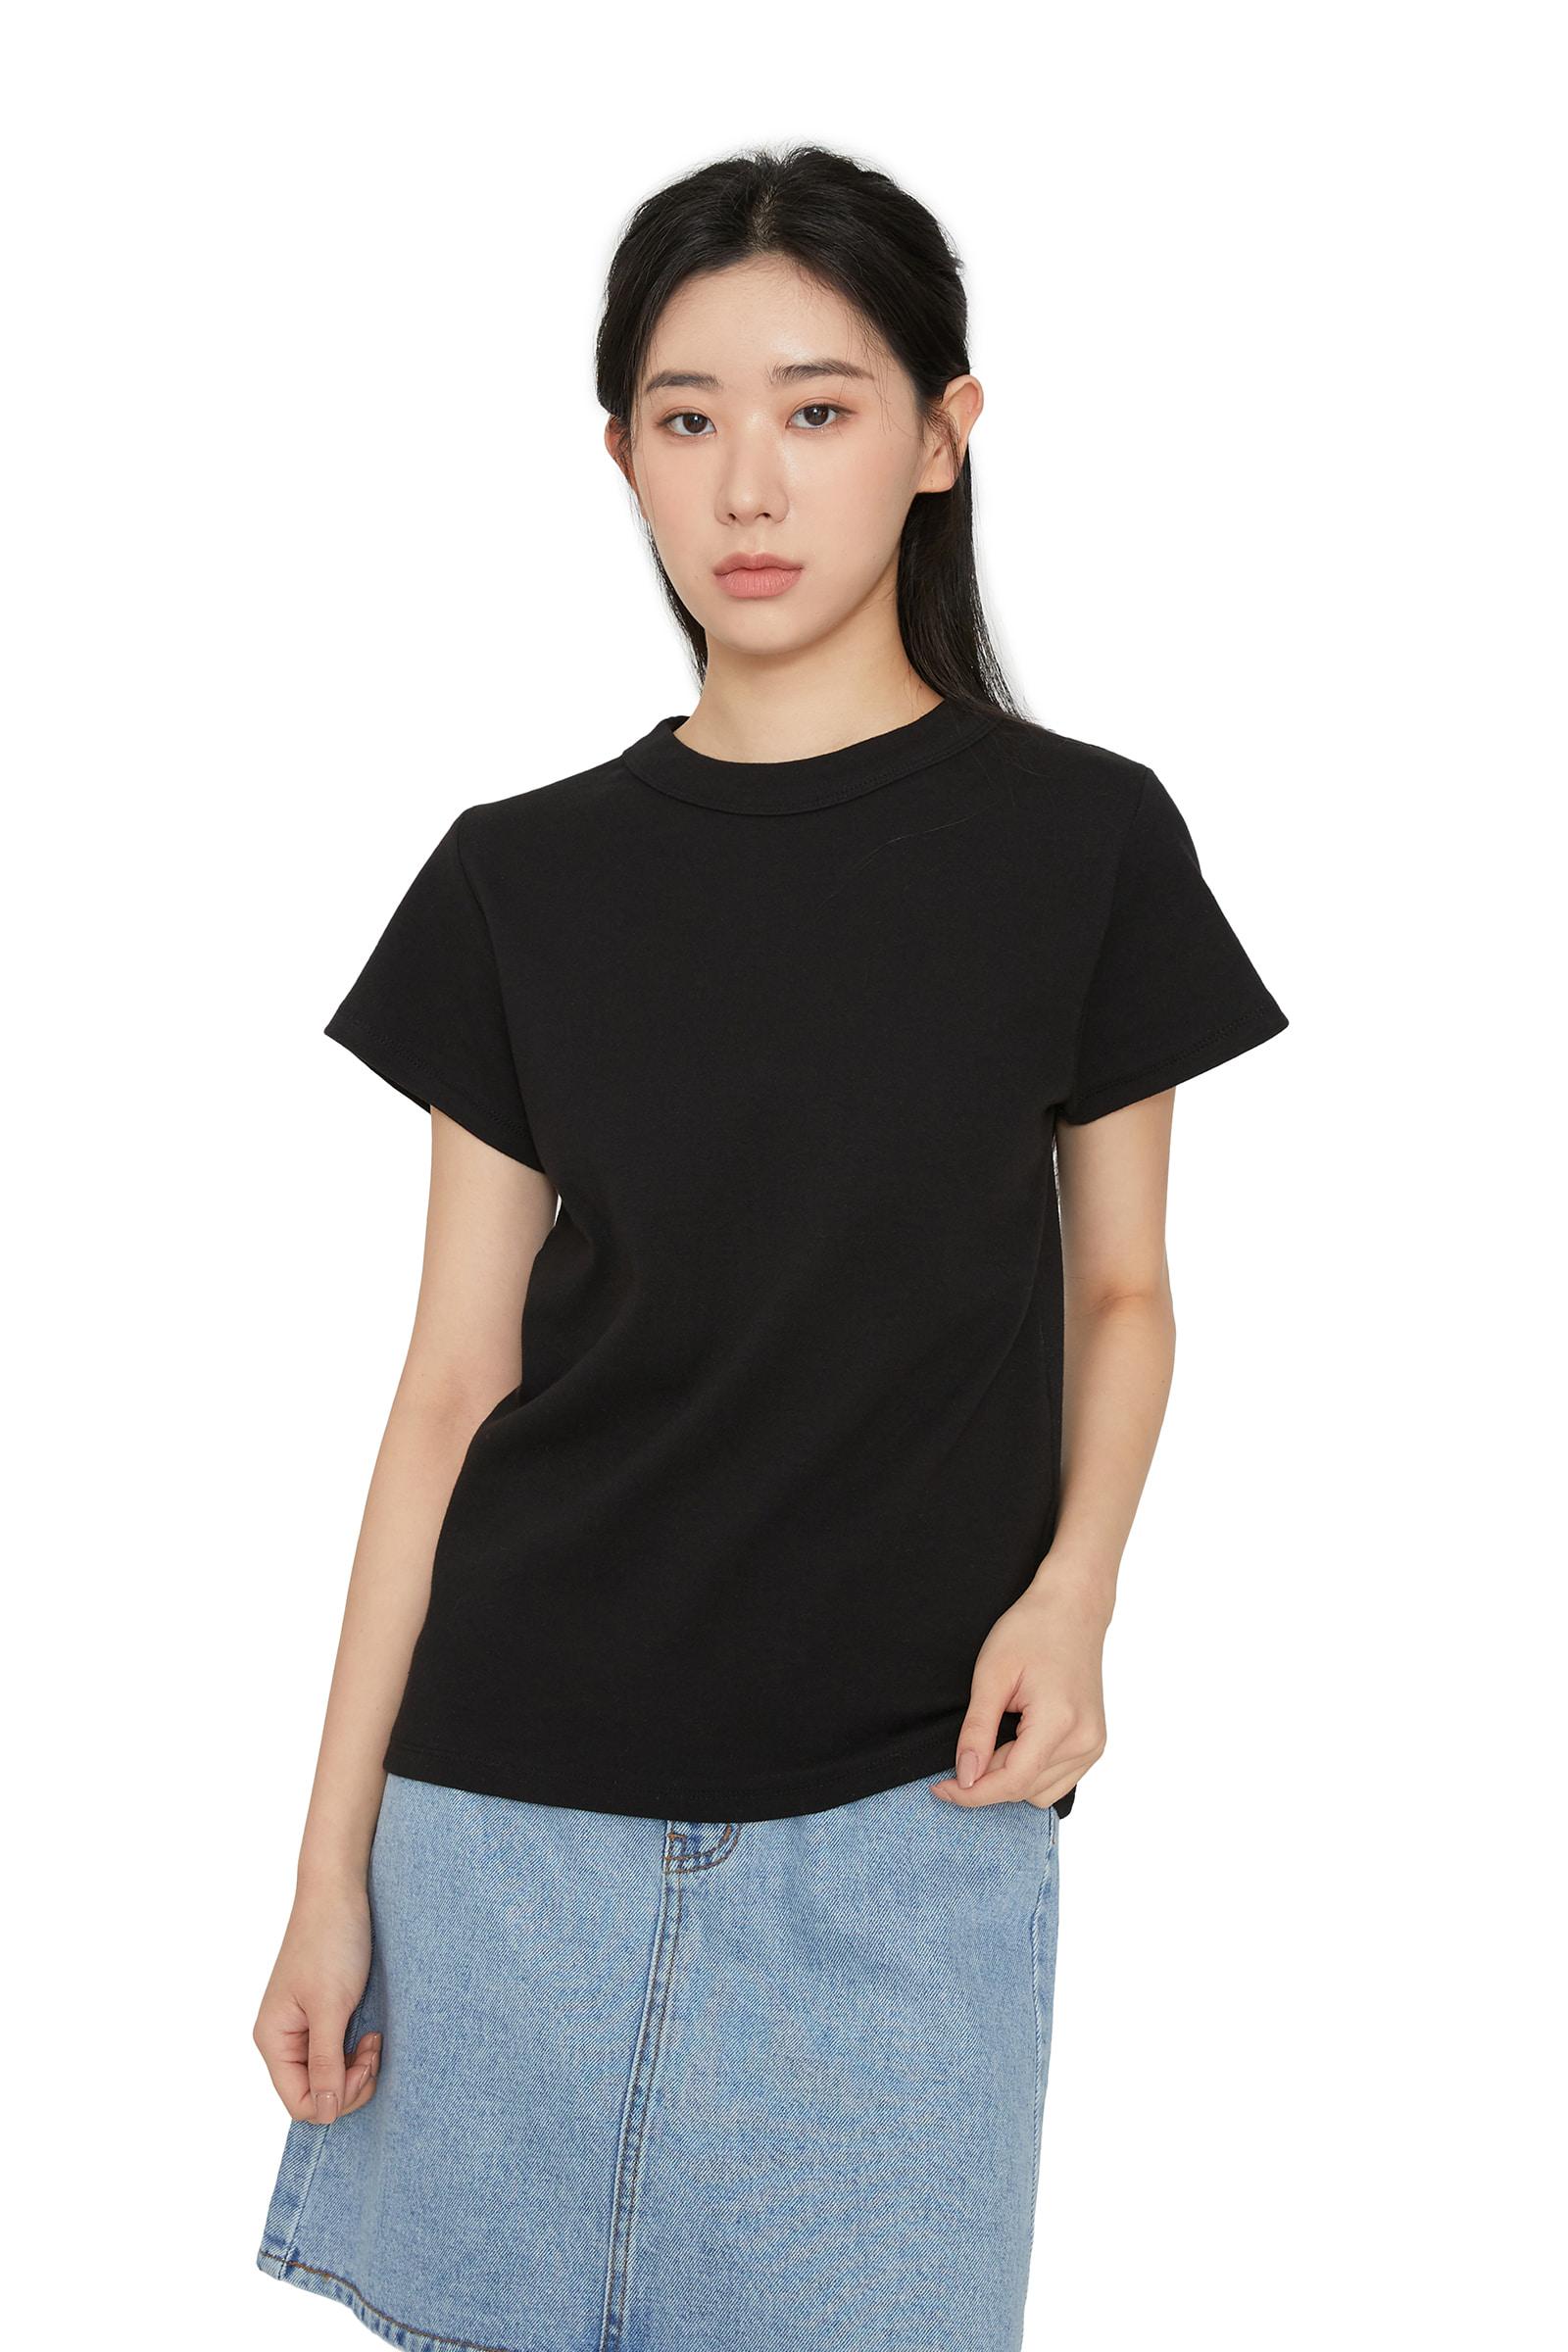 Yogurt crew neck short sleeve T-shirt